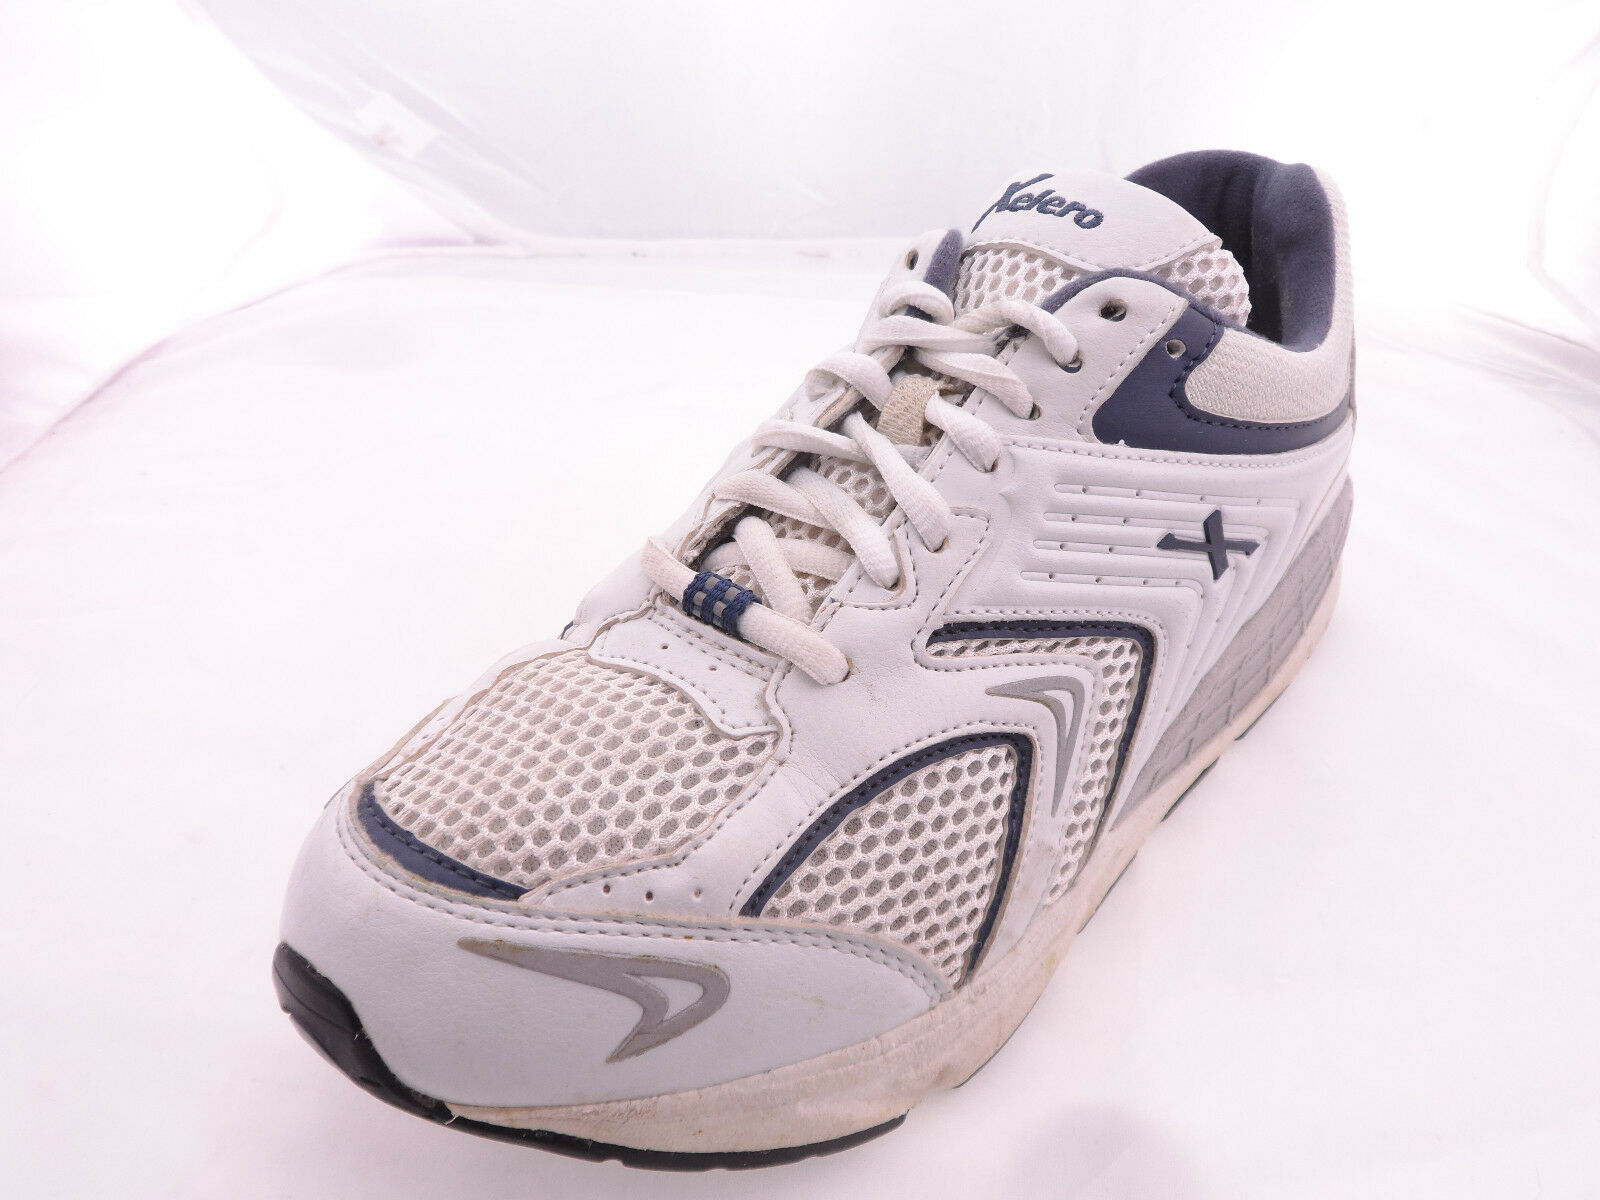 Men's Xelero Matrix Mesh Lace Up Sneaker, Size  8.5 D, White bluee